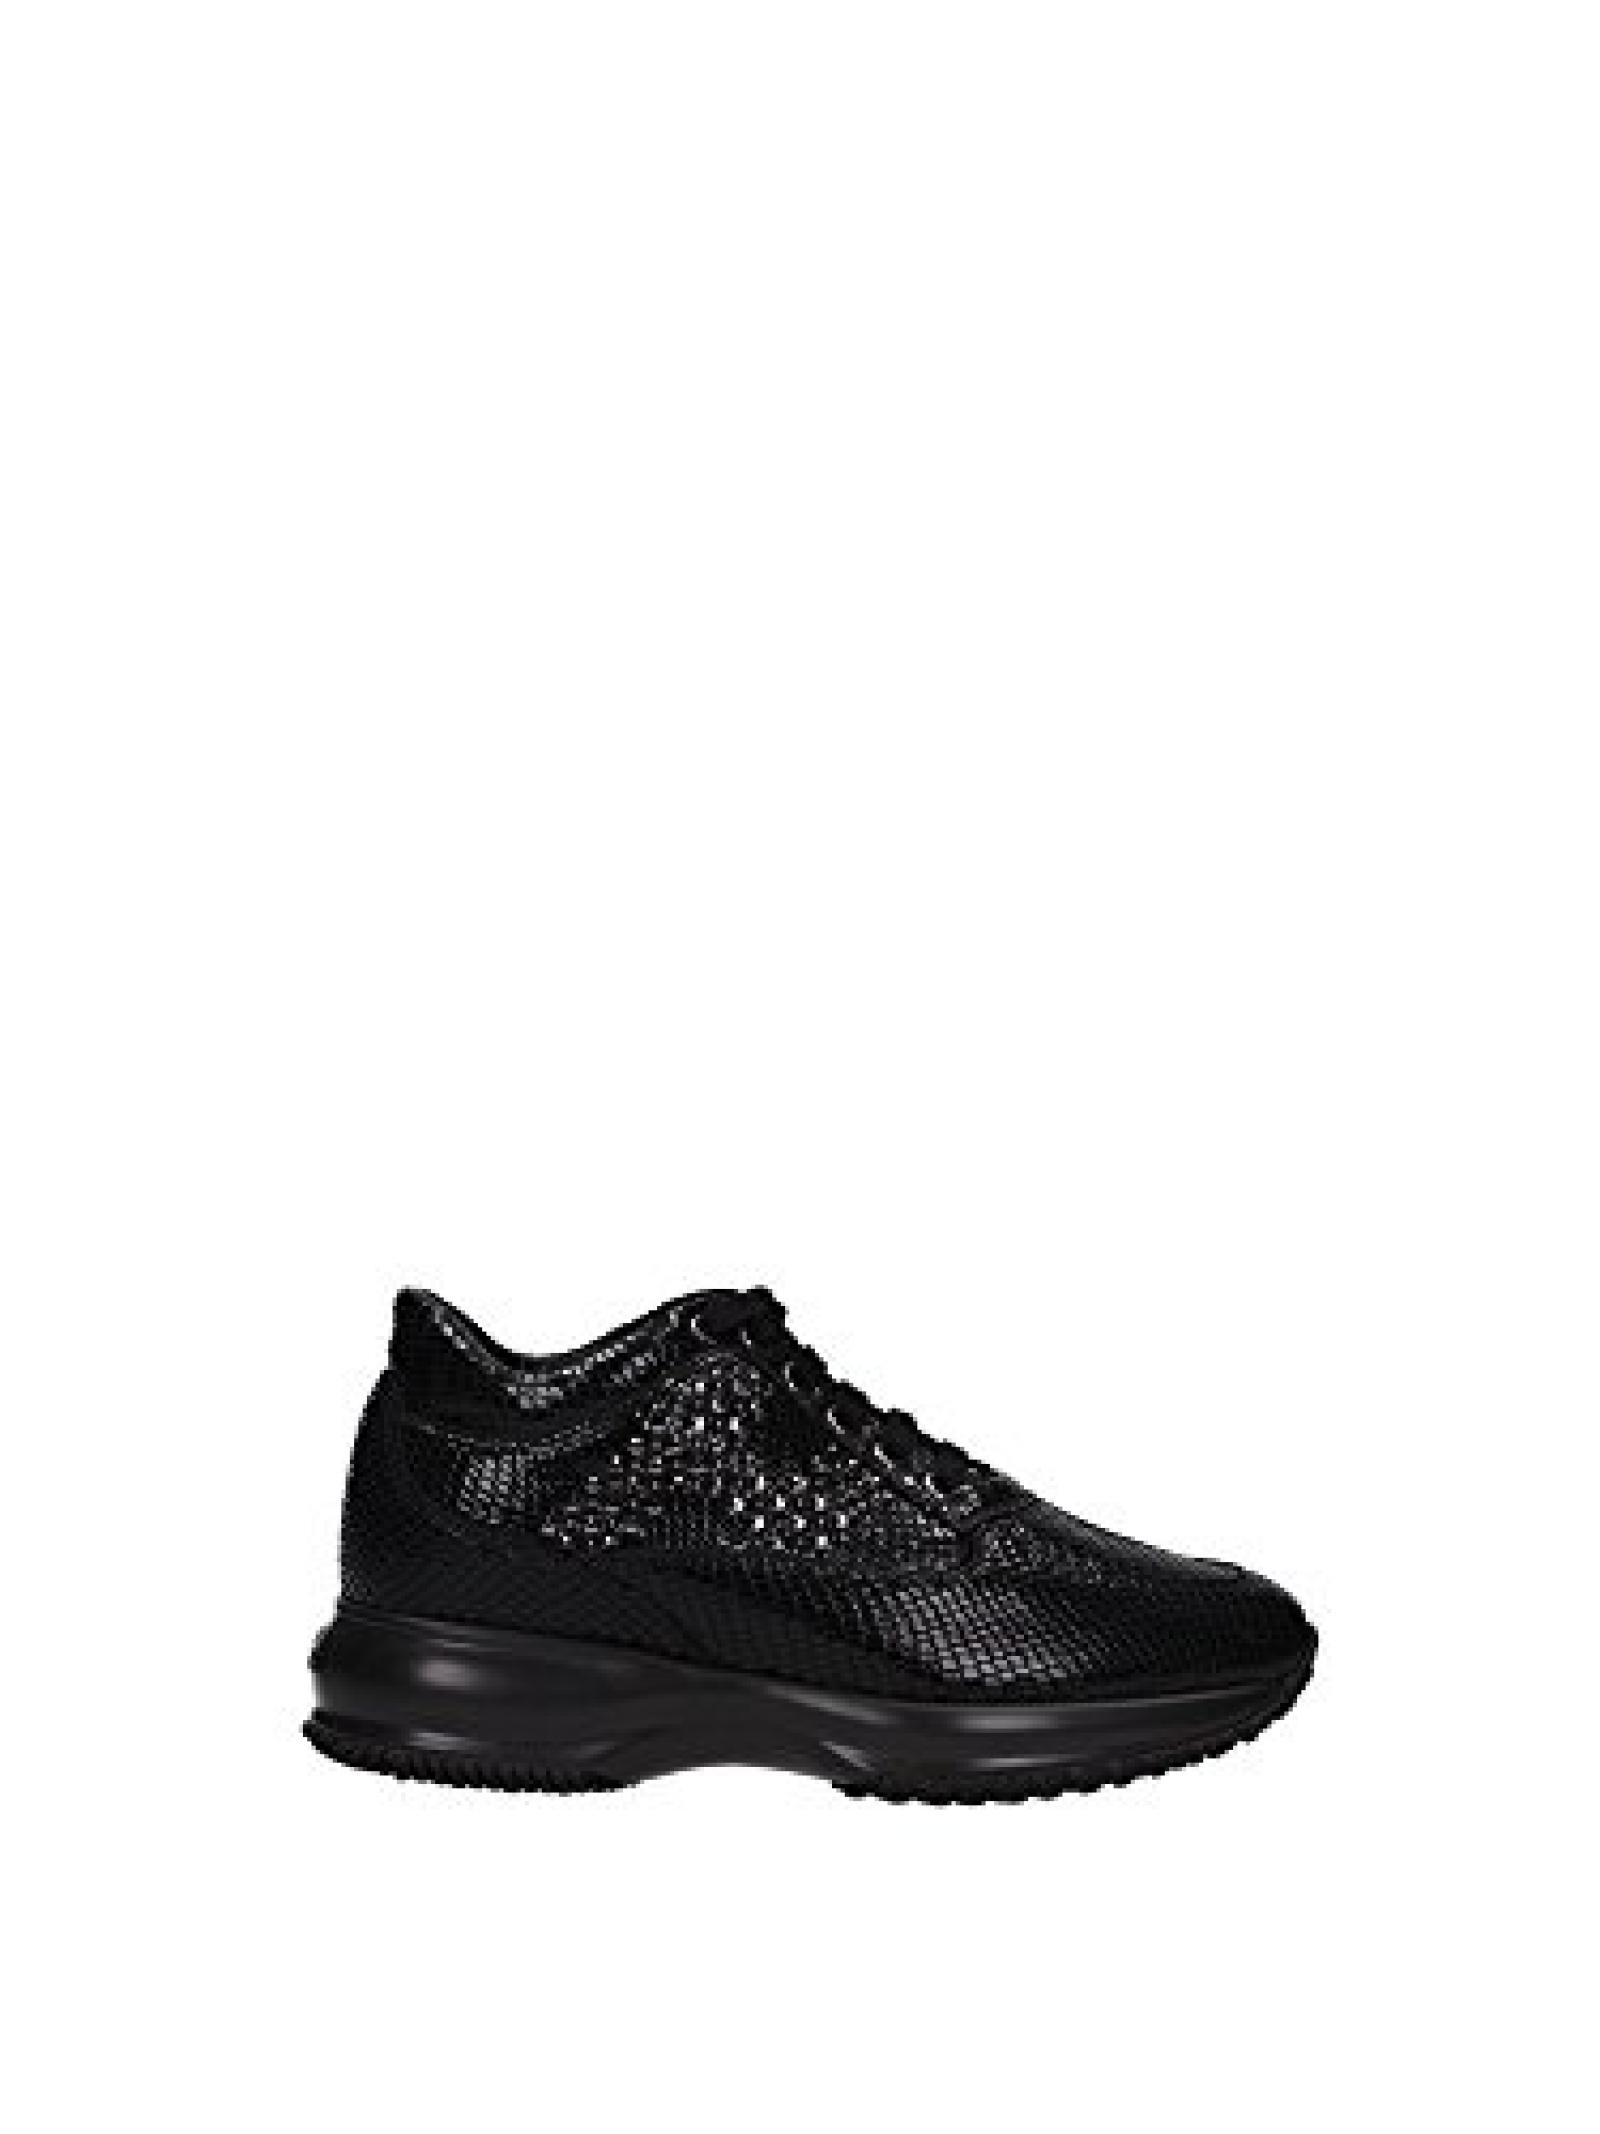 HXW00N0E4306RTB999 Hogan Sneakers Damen Leder